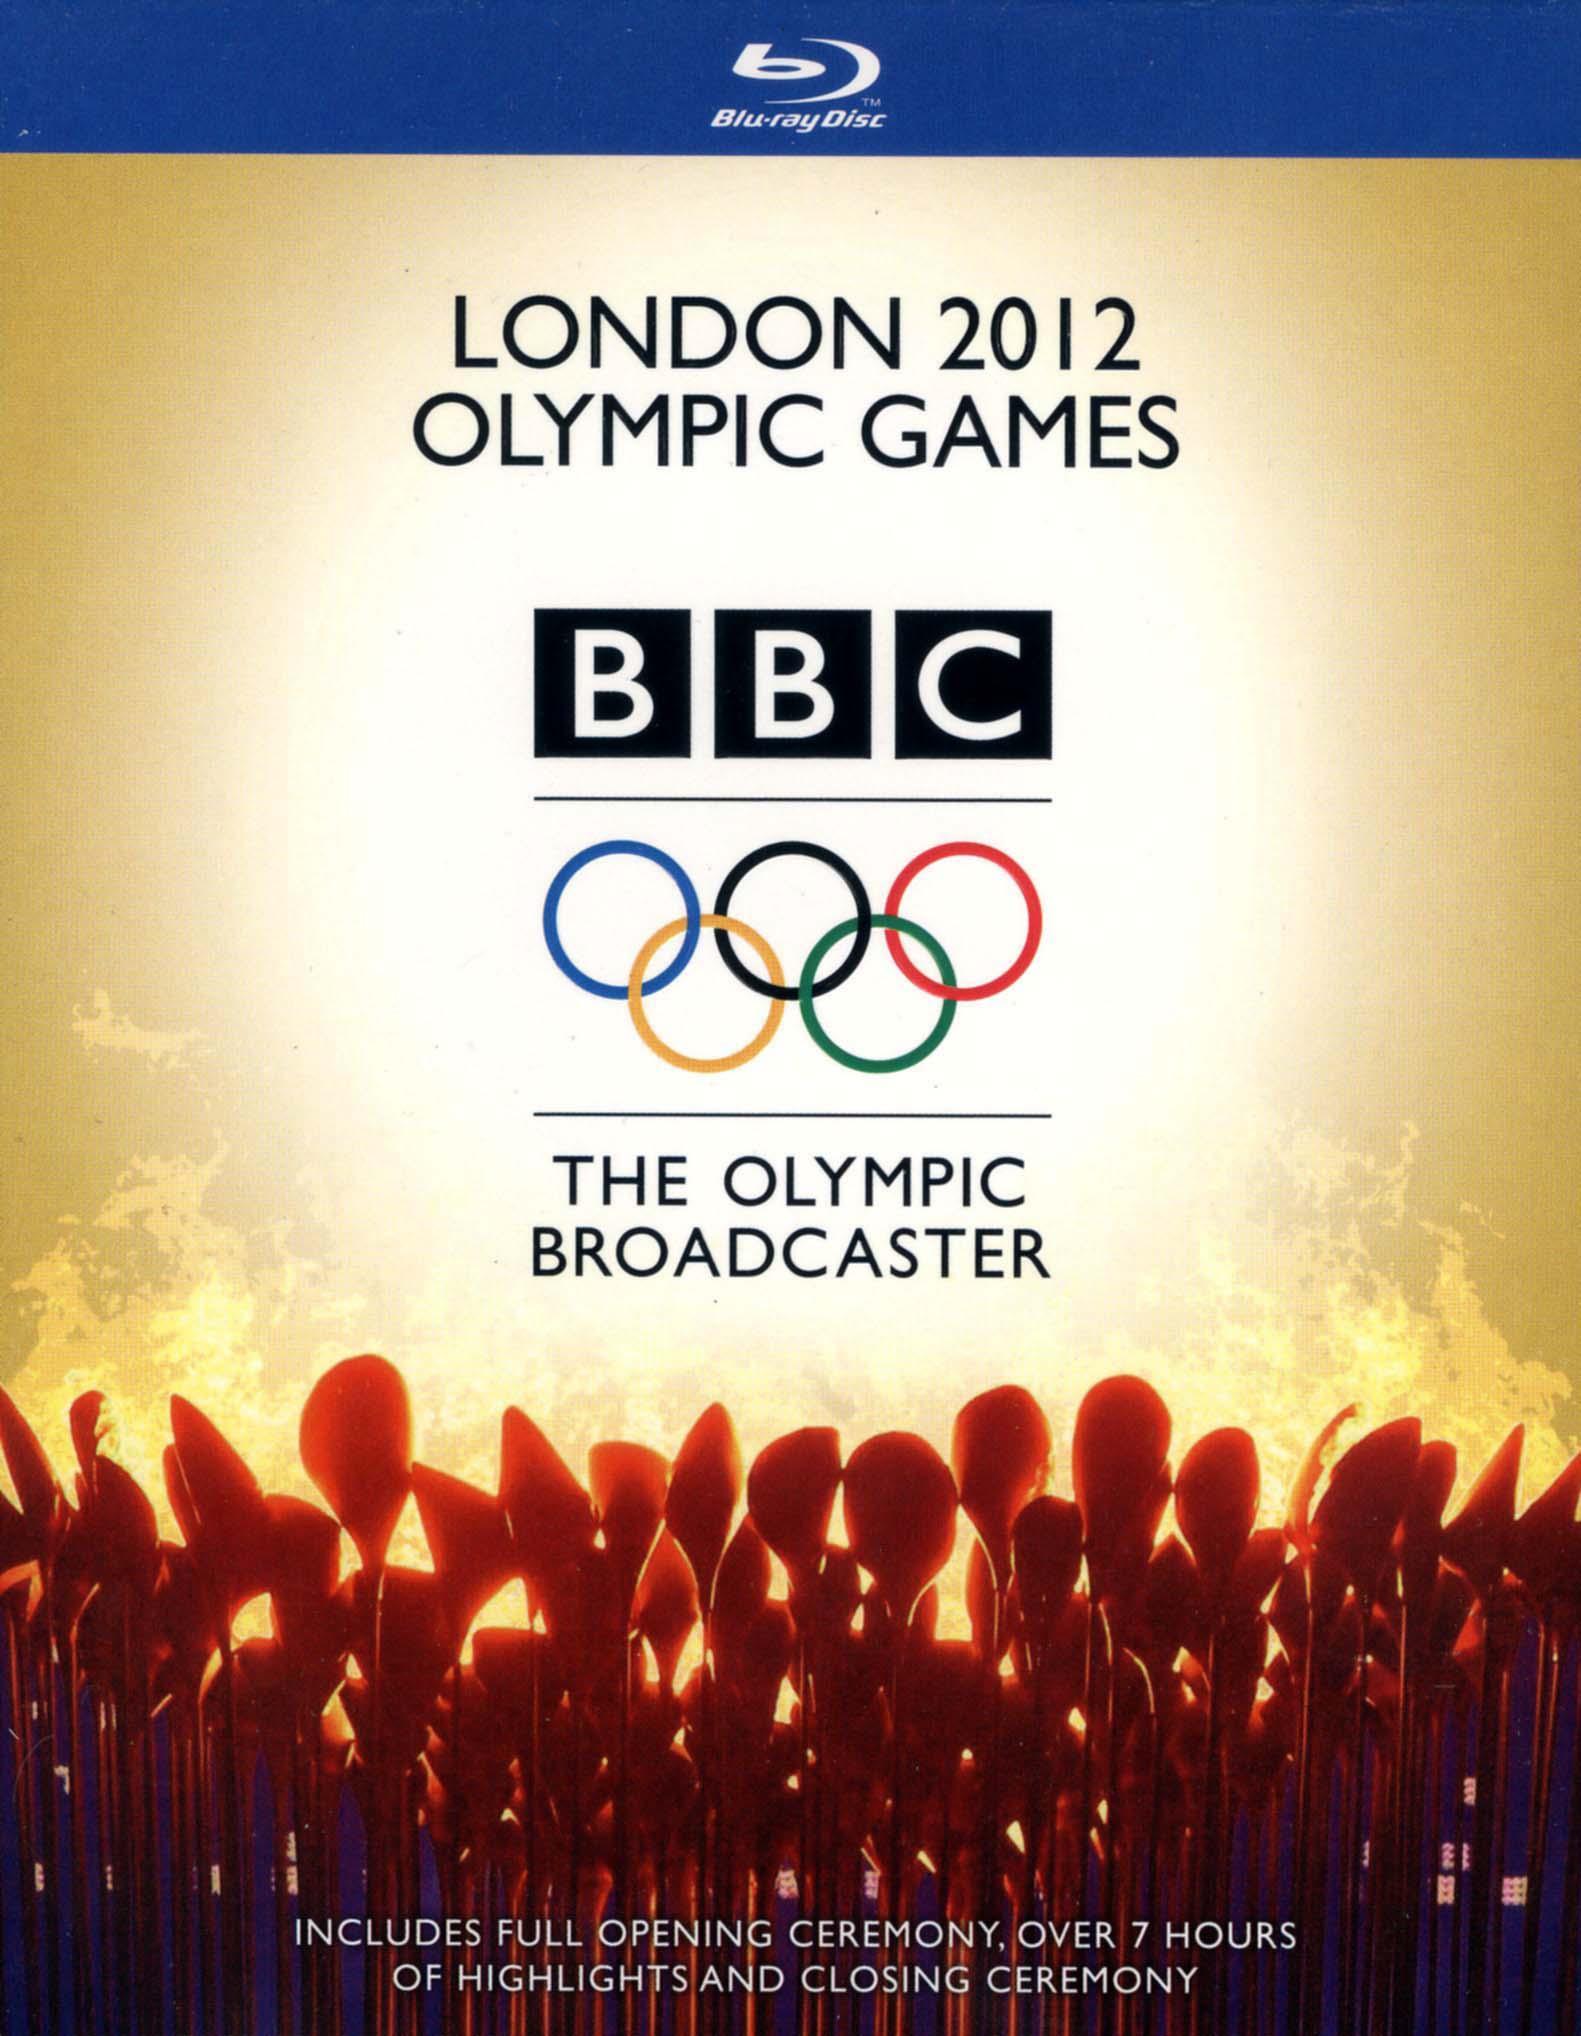 London 2012 Olympic Games: BBC